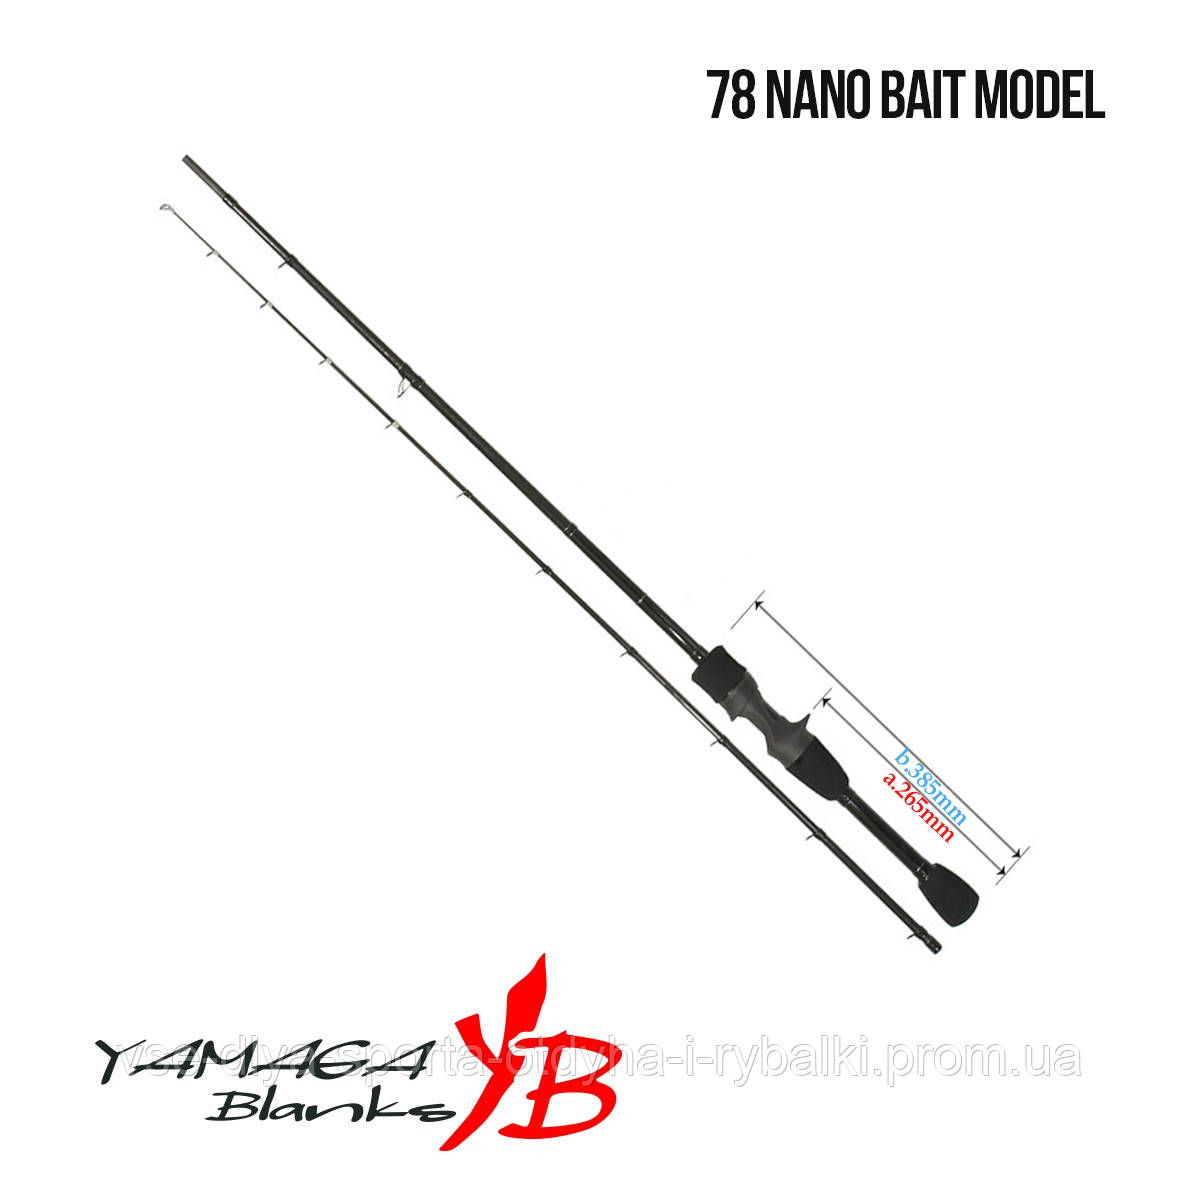 Удилище Yamaga Blanks Blue Current 78 NANO Bait Model